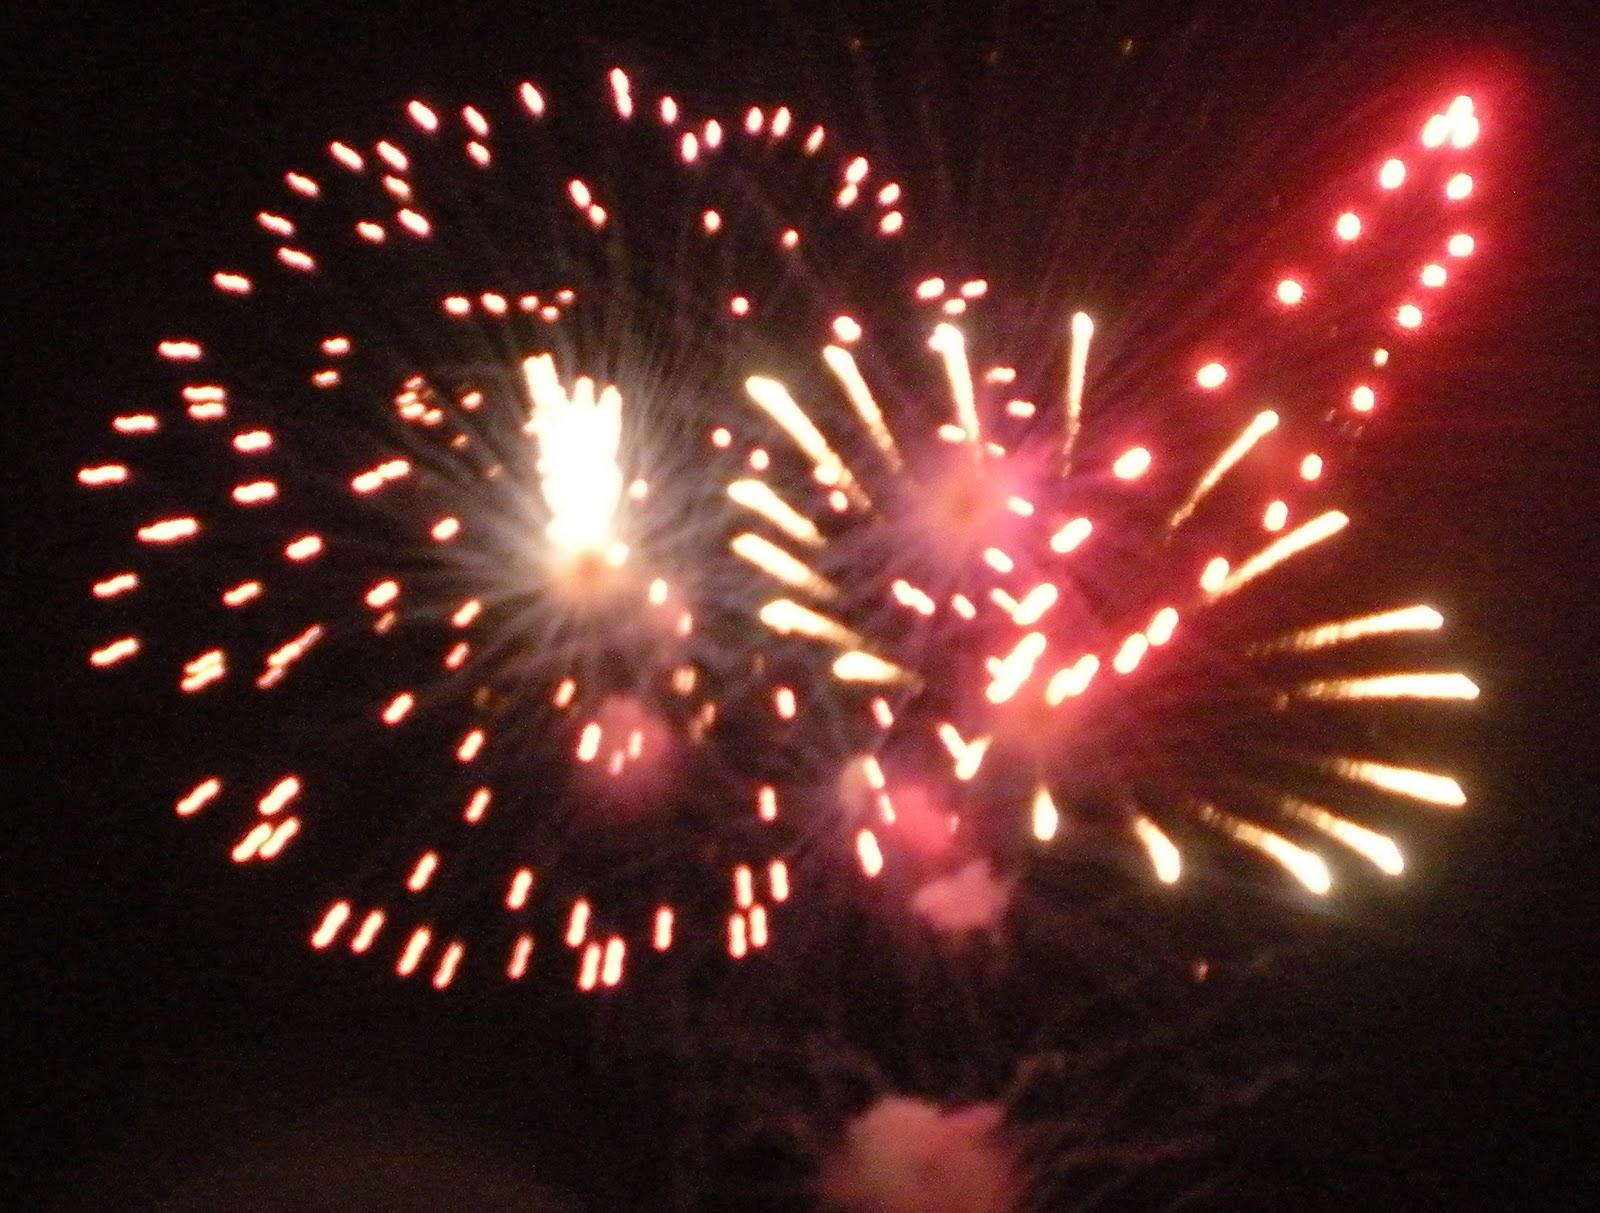 http://4.bp.blogspot.com/-01EEetqTVp8/Trkuc29PL9I/AAAAAAAAAhk/YkIPri3rTFk/s1600/Town%2Band%2BBowdon%2Bfireworks%2BNov%2B11%2B022.jpg